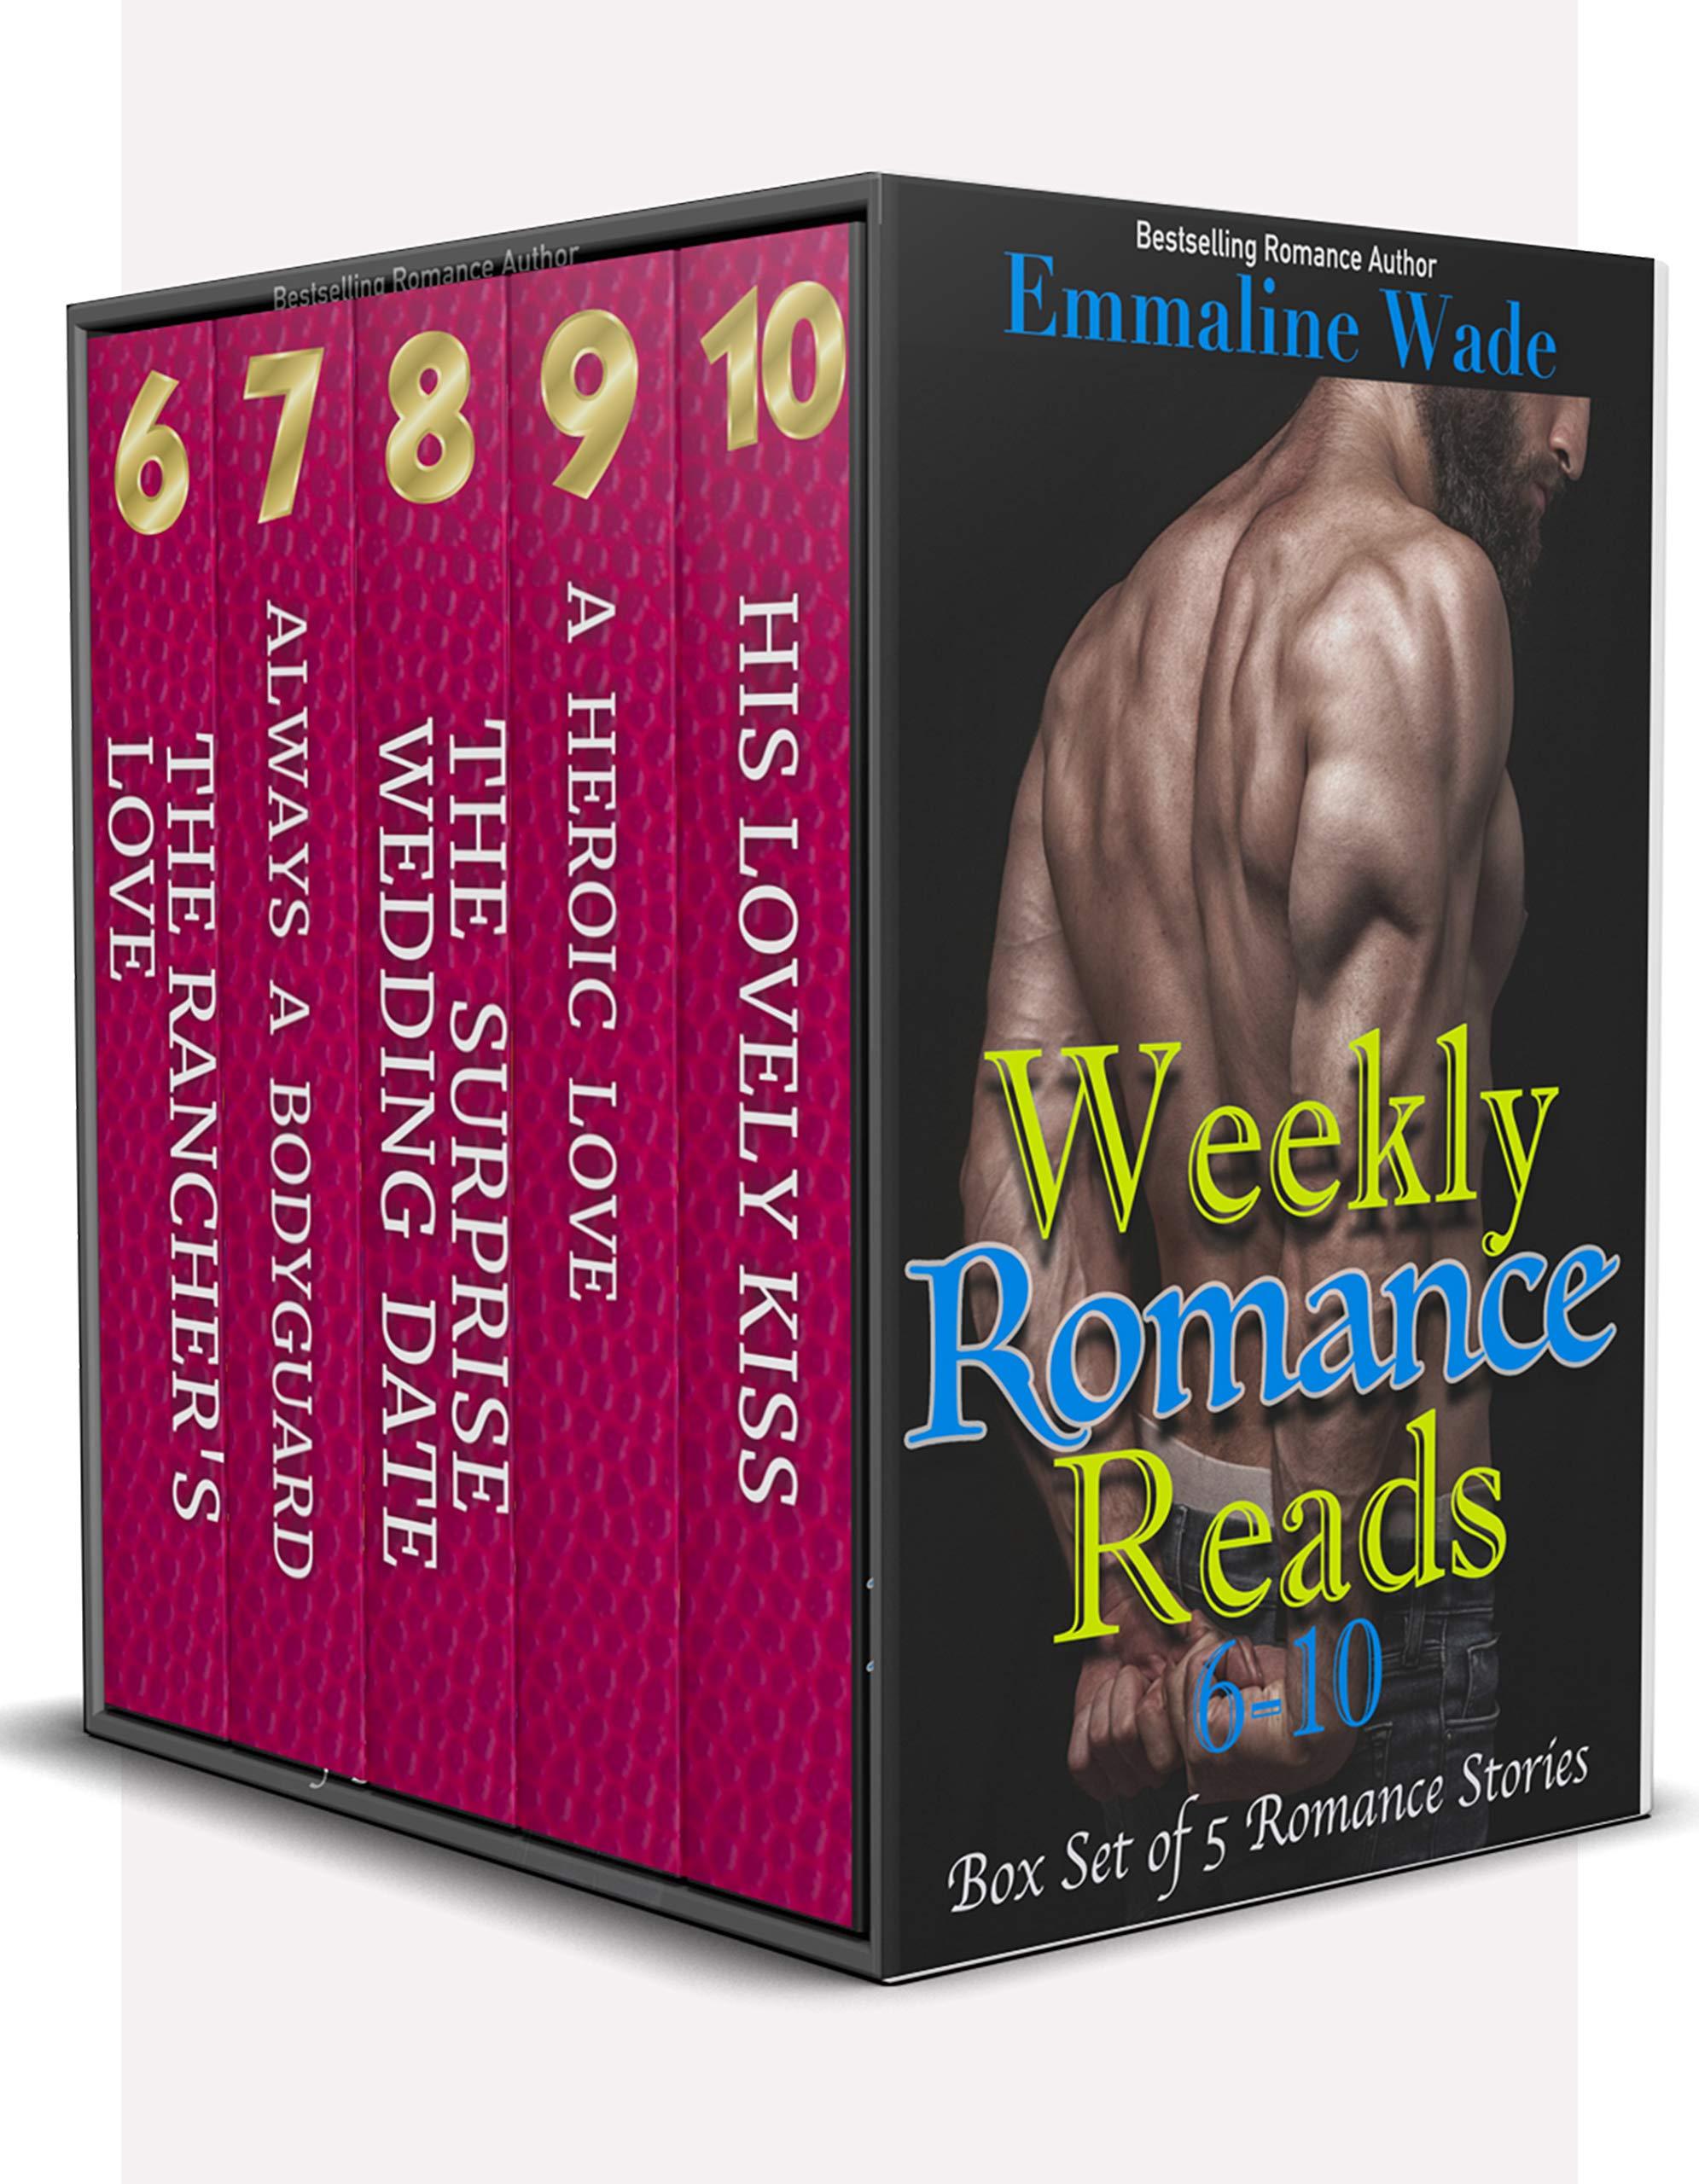 The Weekly Romance Reads Box Volume Set #6-#10